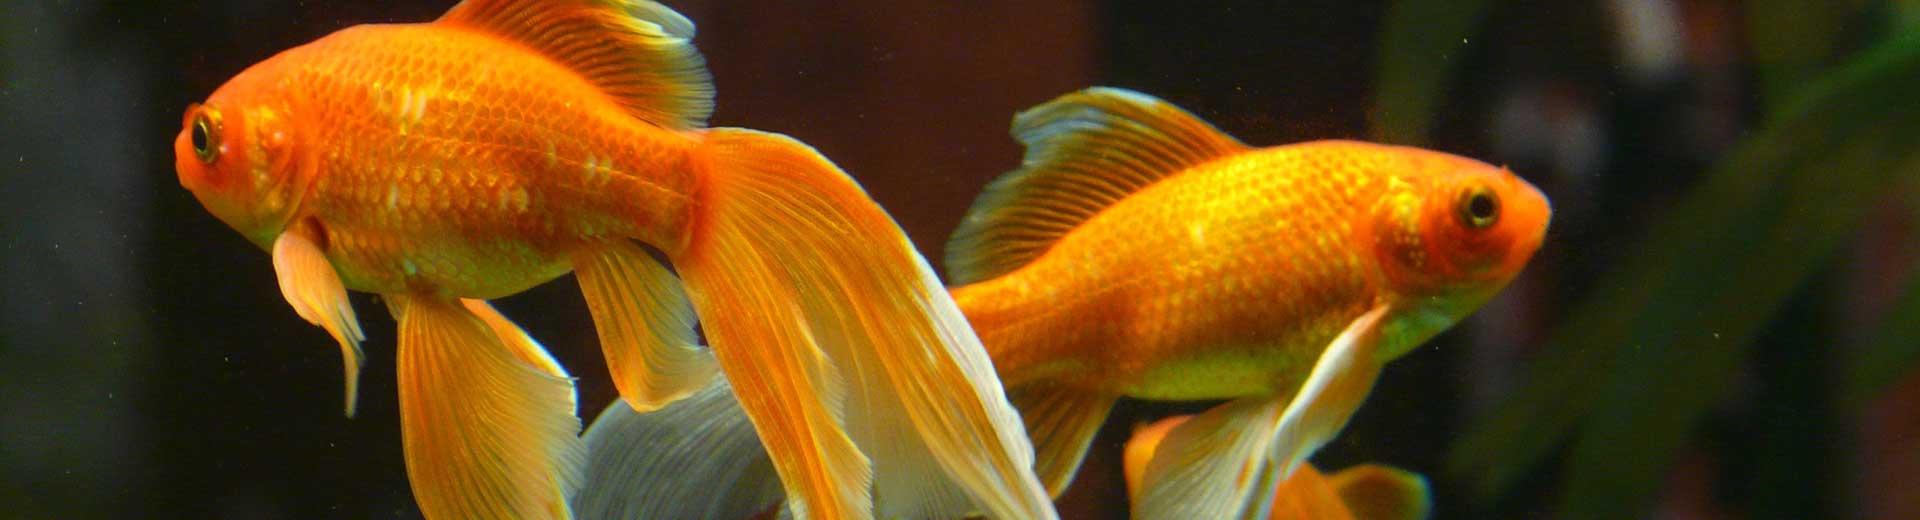 Andere dieren - goudvis